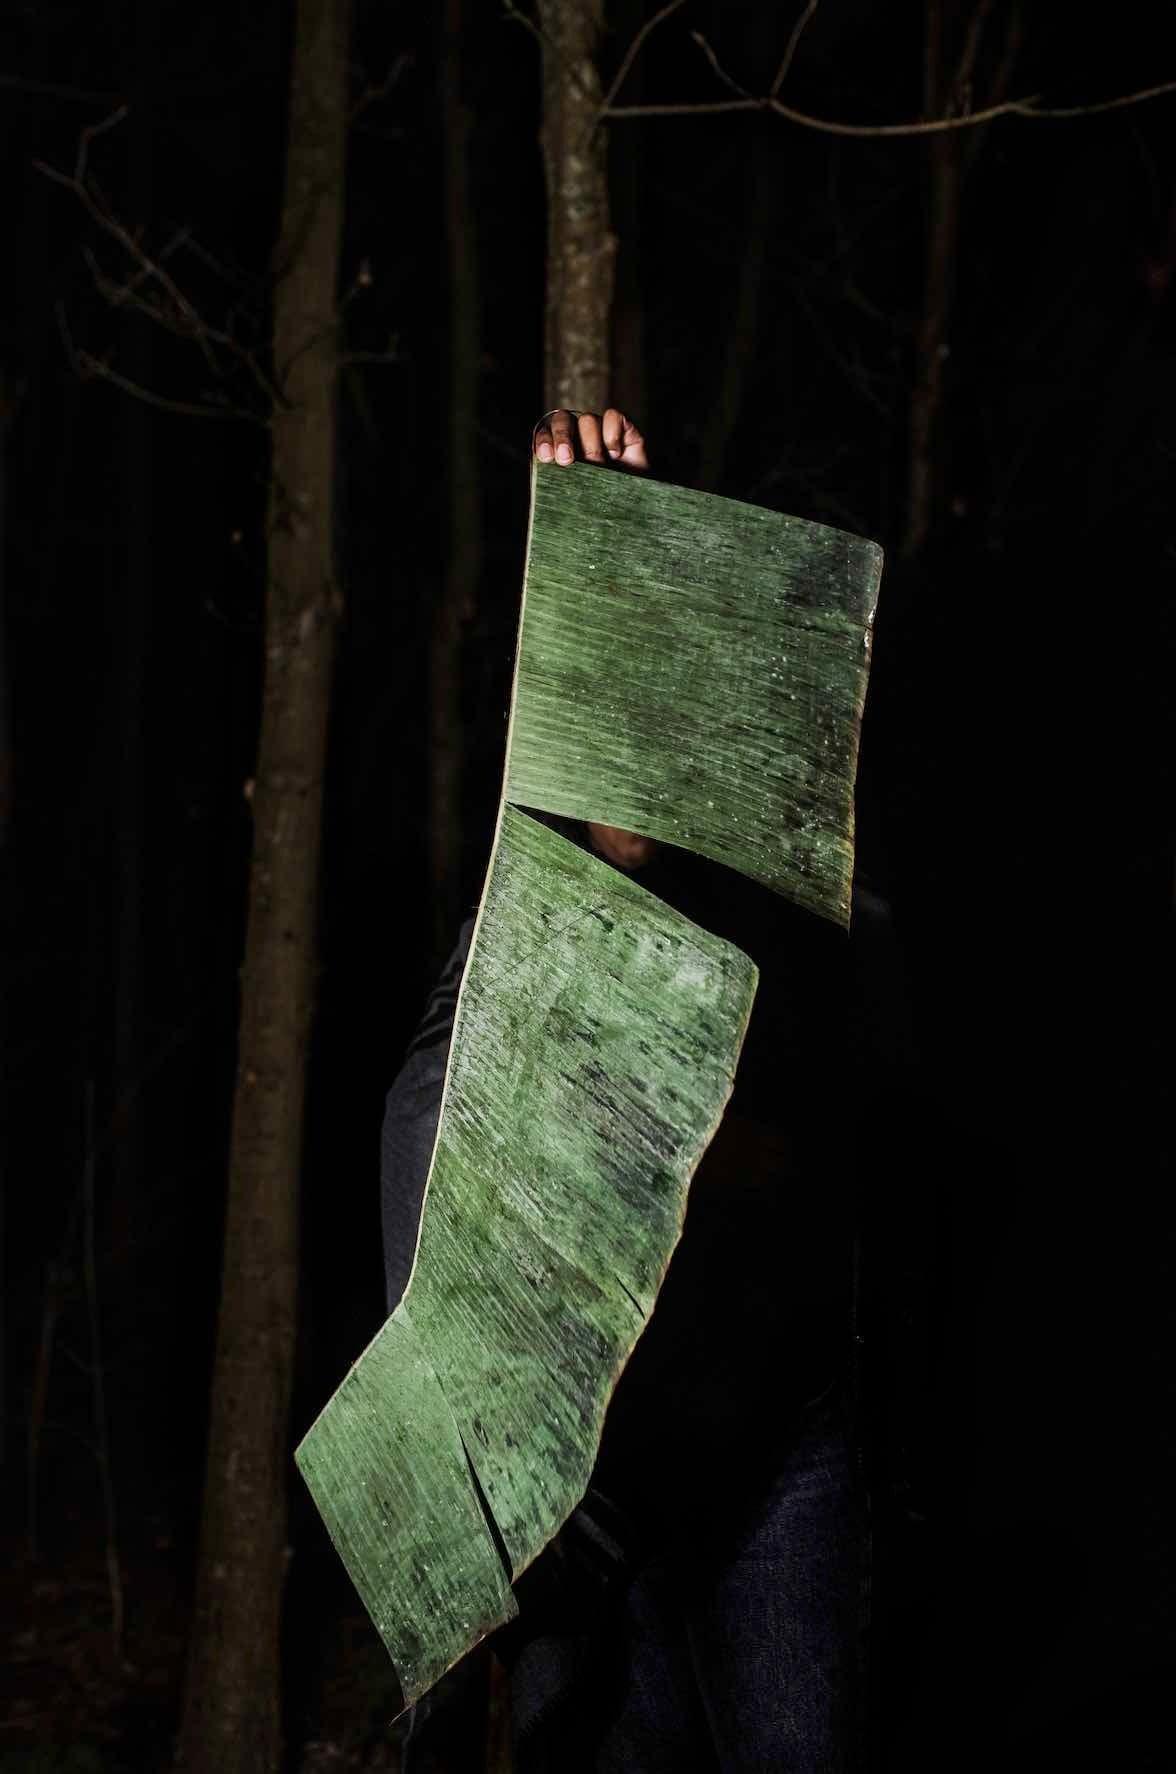 Trunk, Darkness, Leaf, Wood